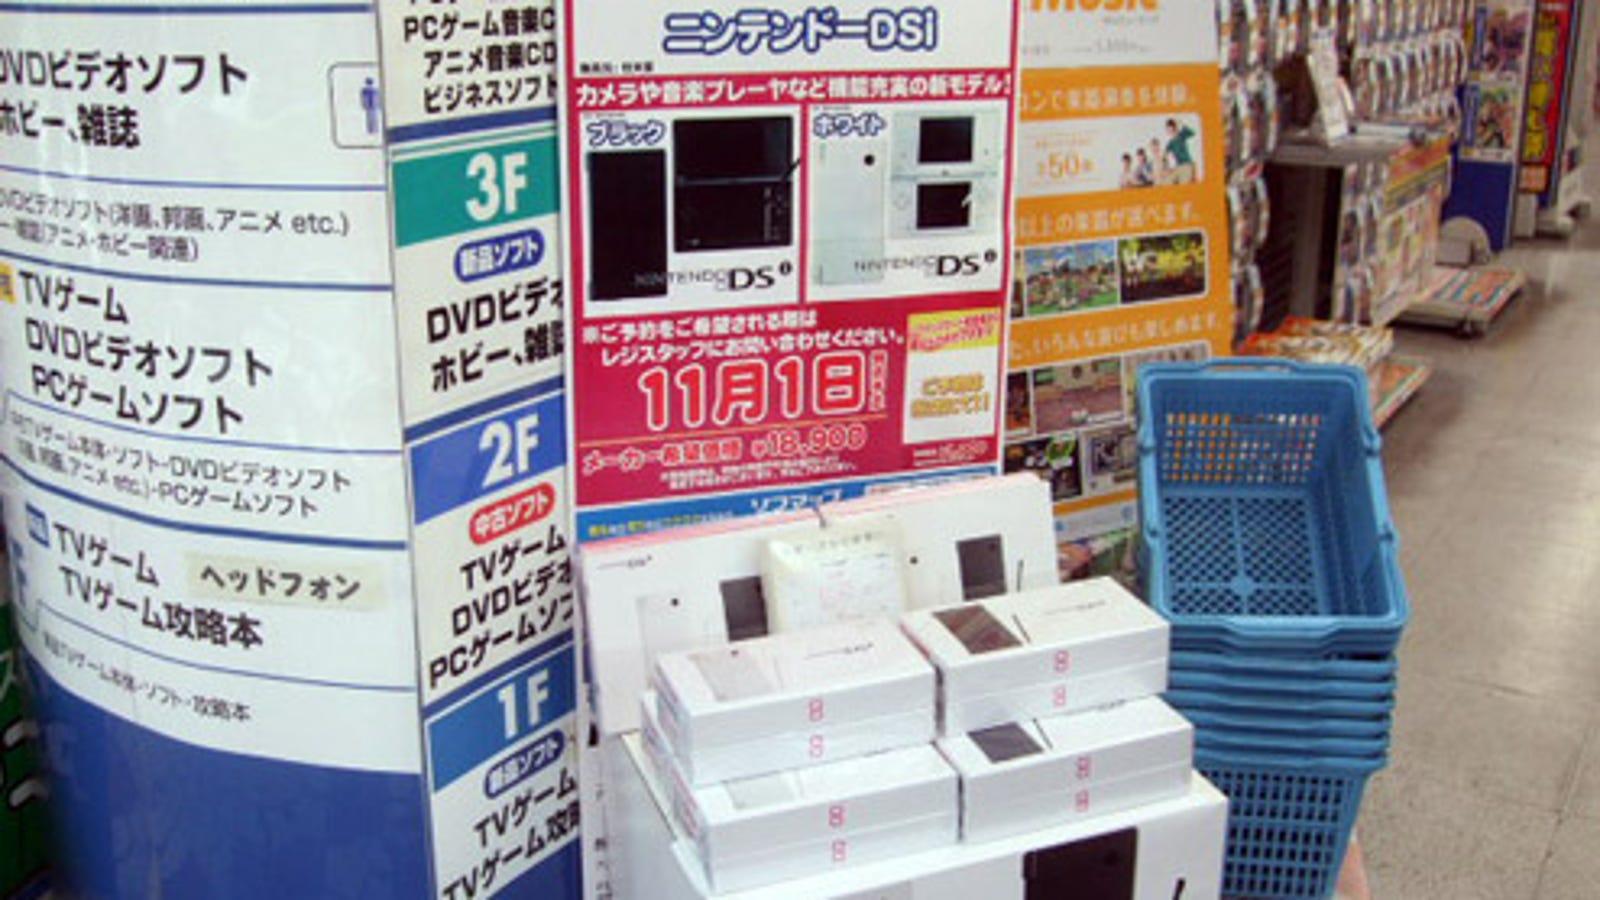 The Nintendo DSi, The Box It Comes In